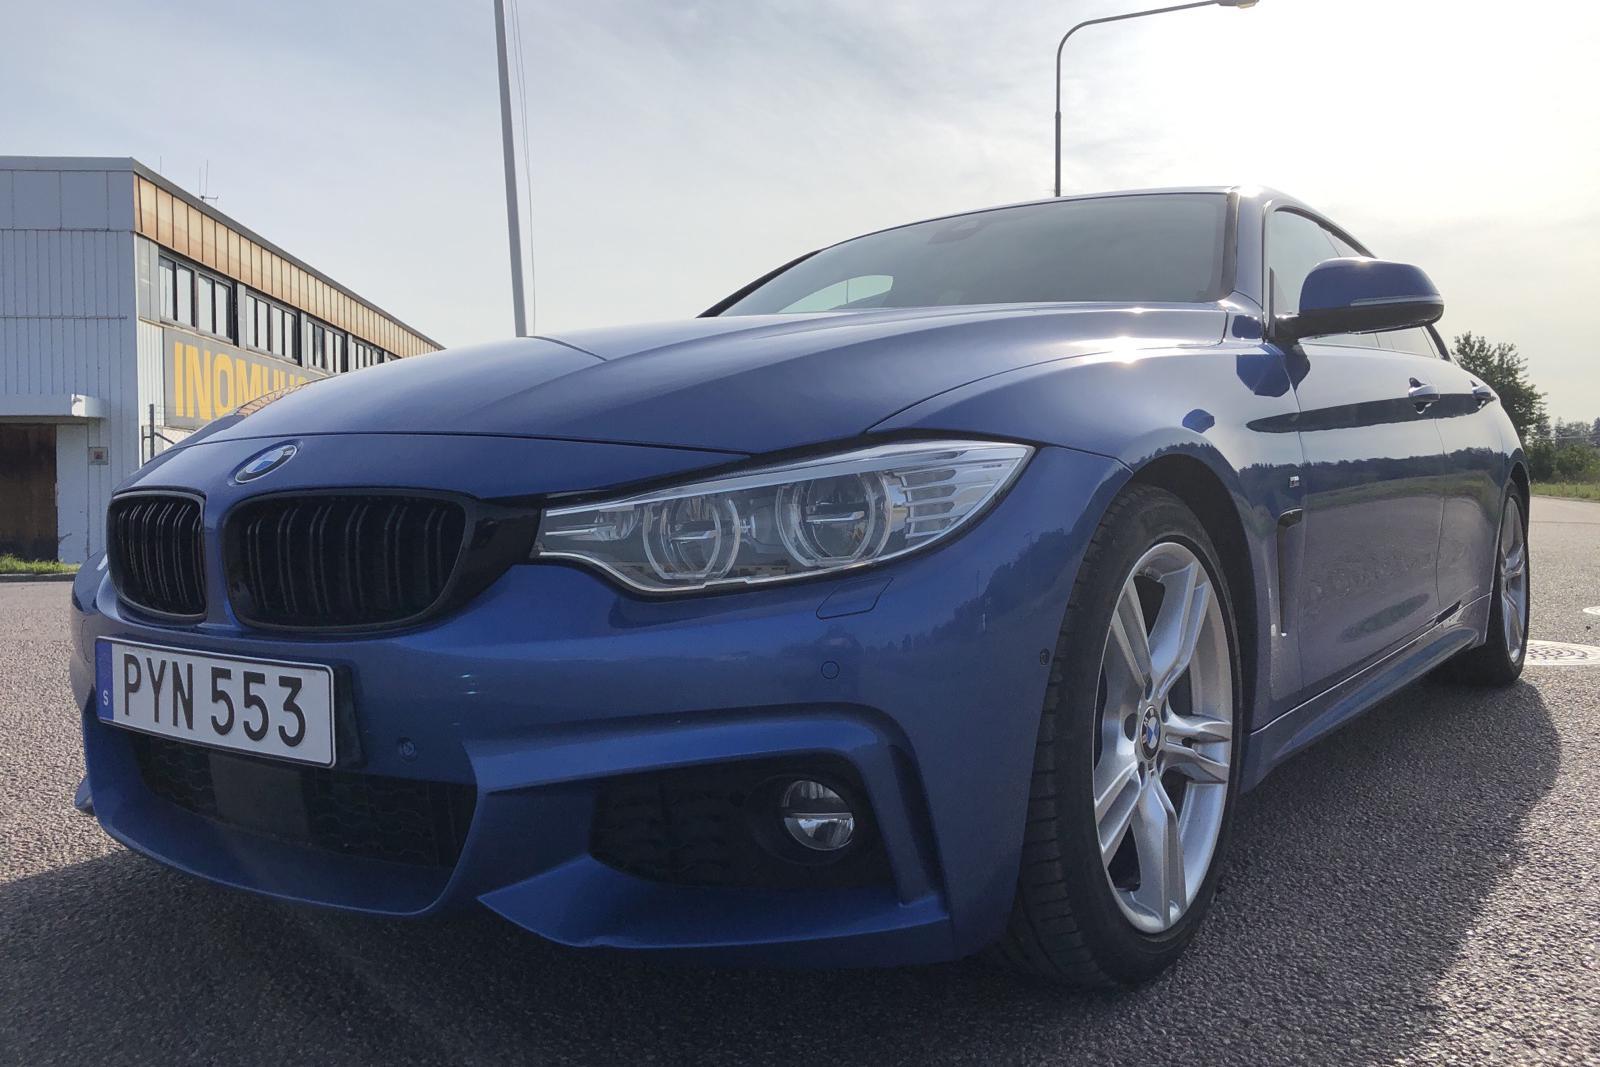 BMW 430i xDrive Gran Coupé, F36 (252hk) - 140 070 km - Automatic - blue - 2016